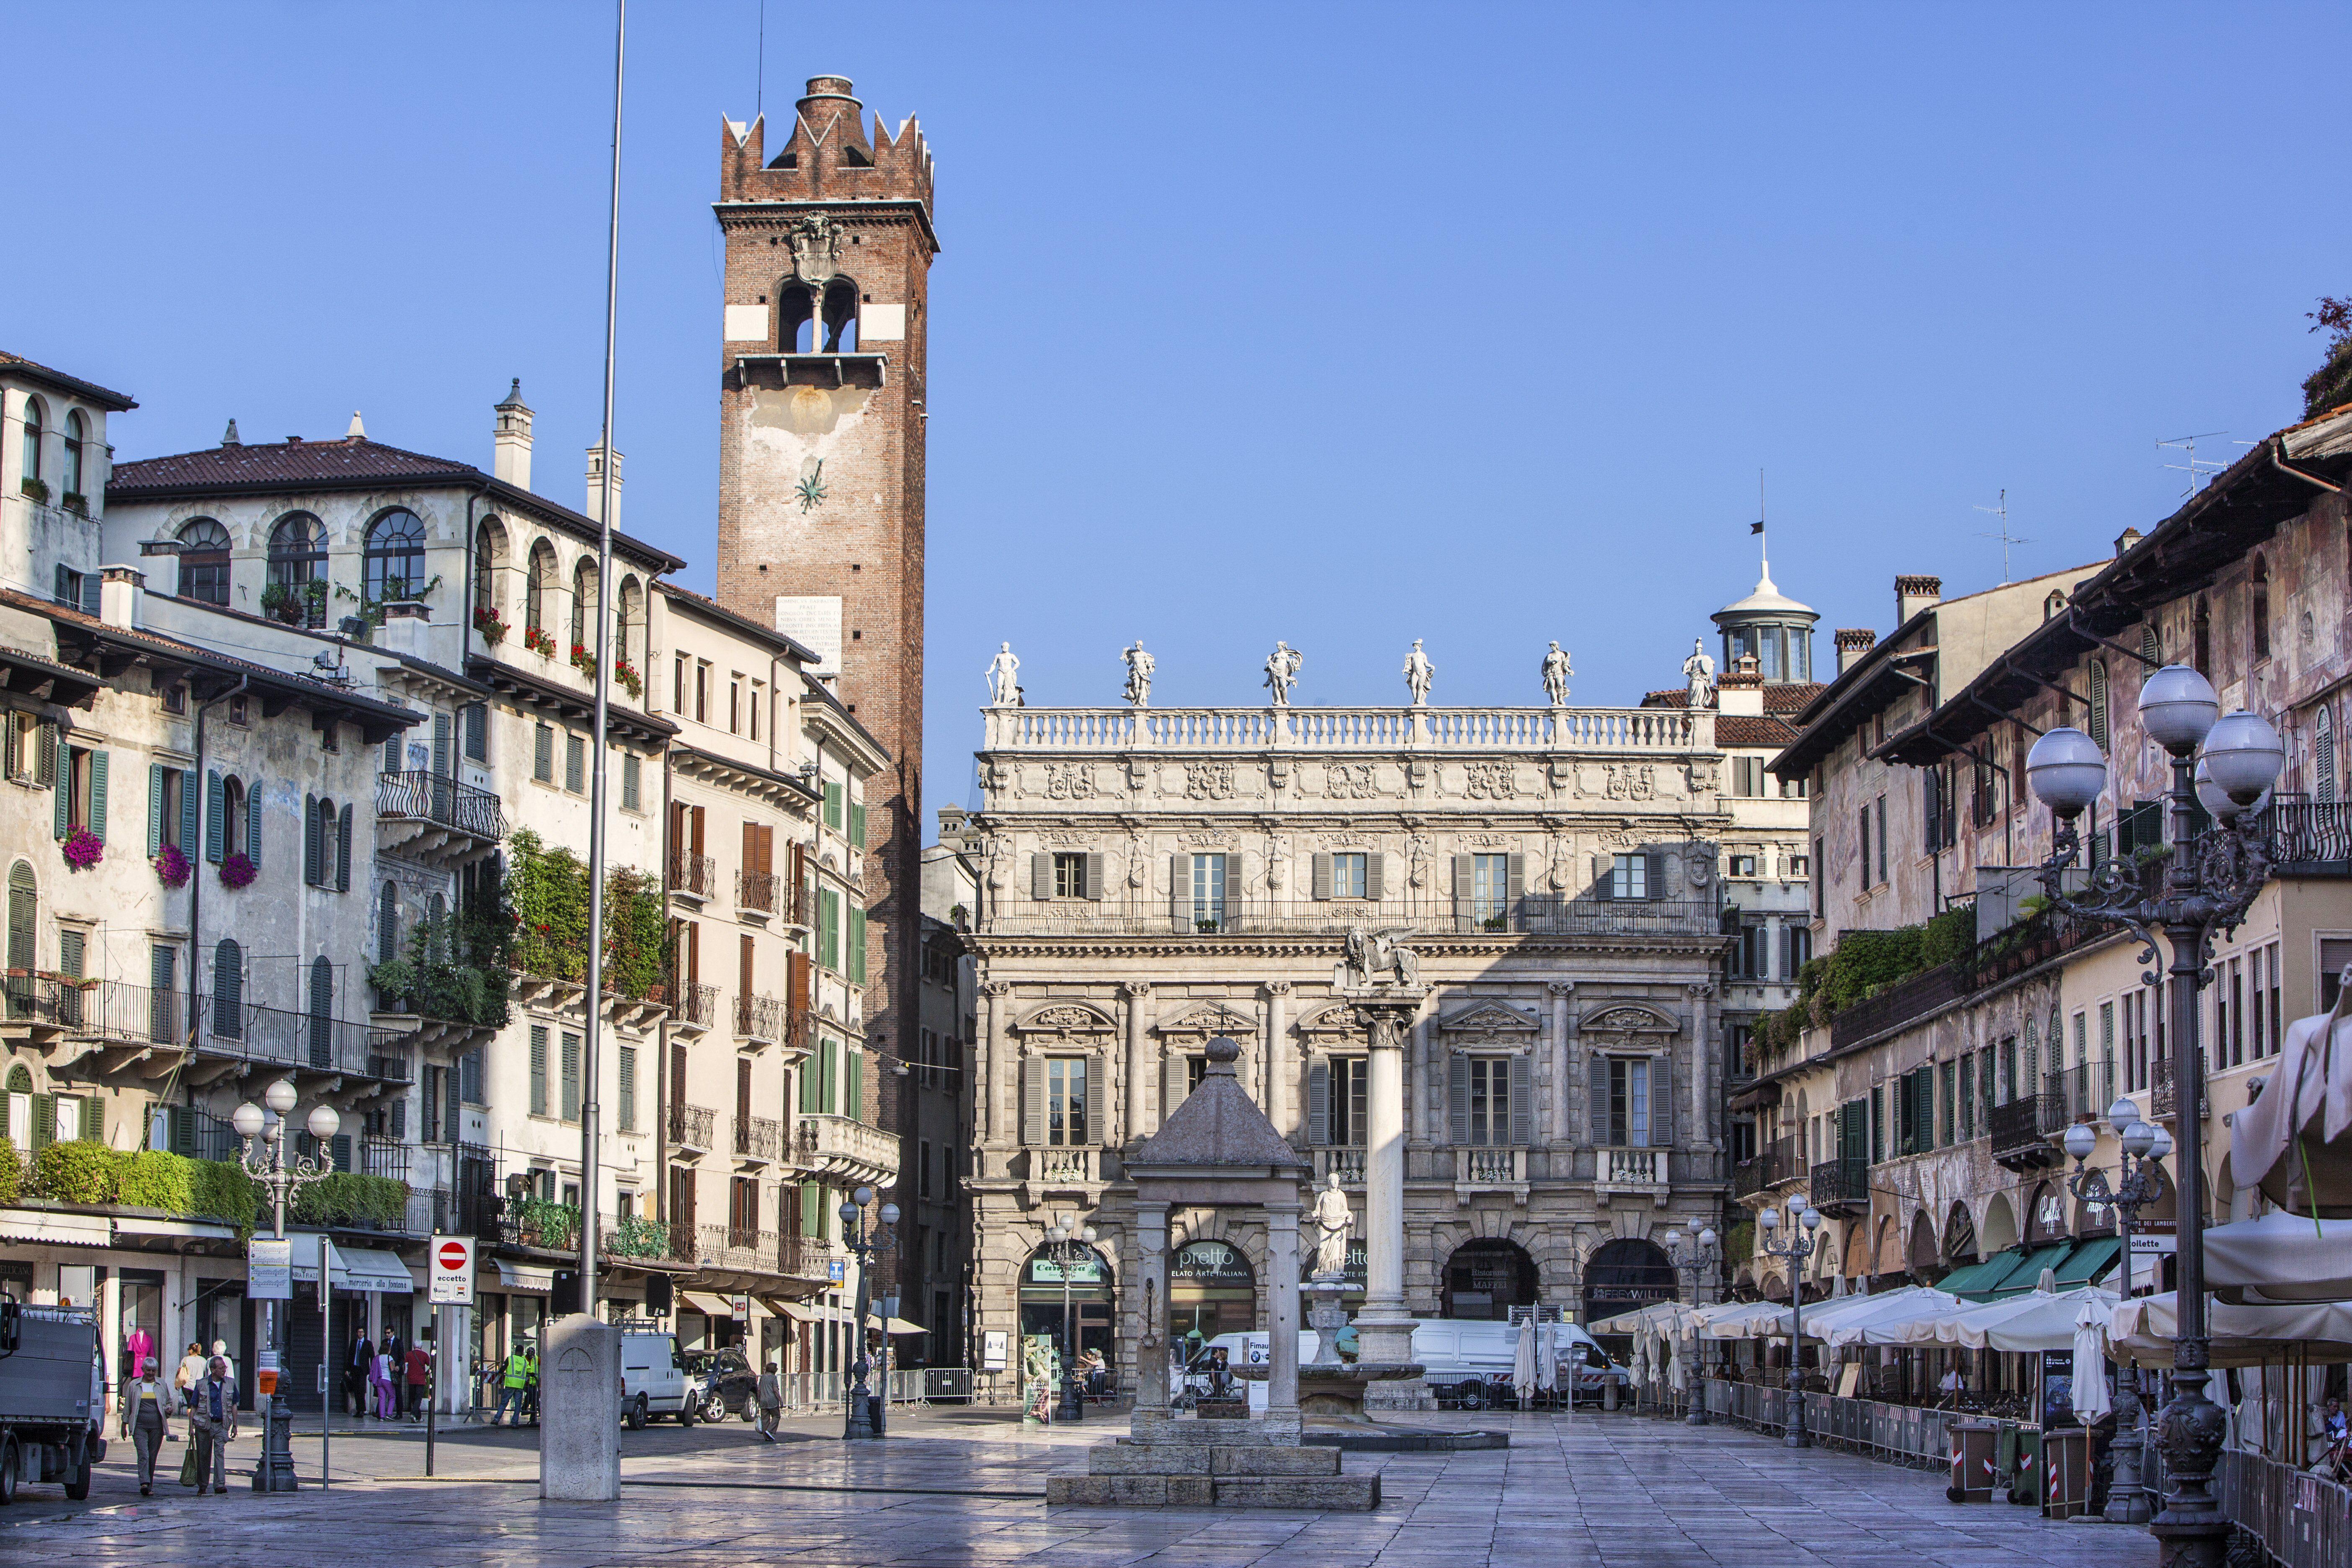 Photo of Piazza Erbe in Verona, Italy